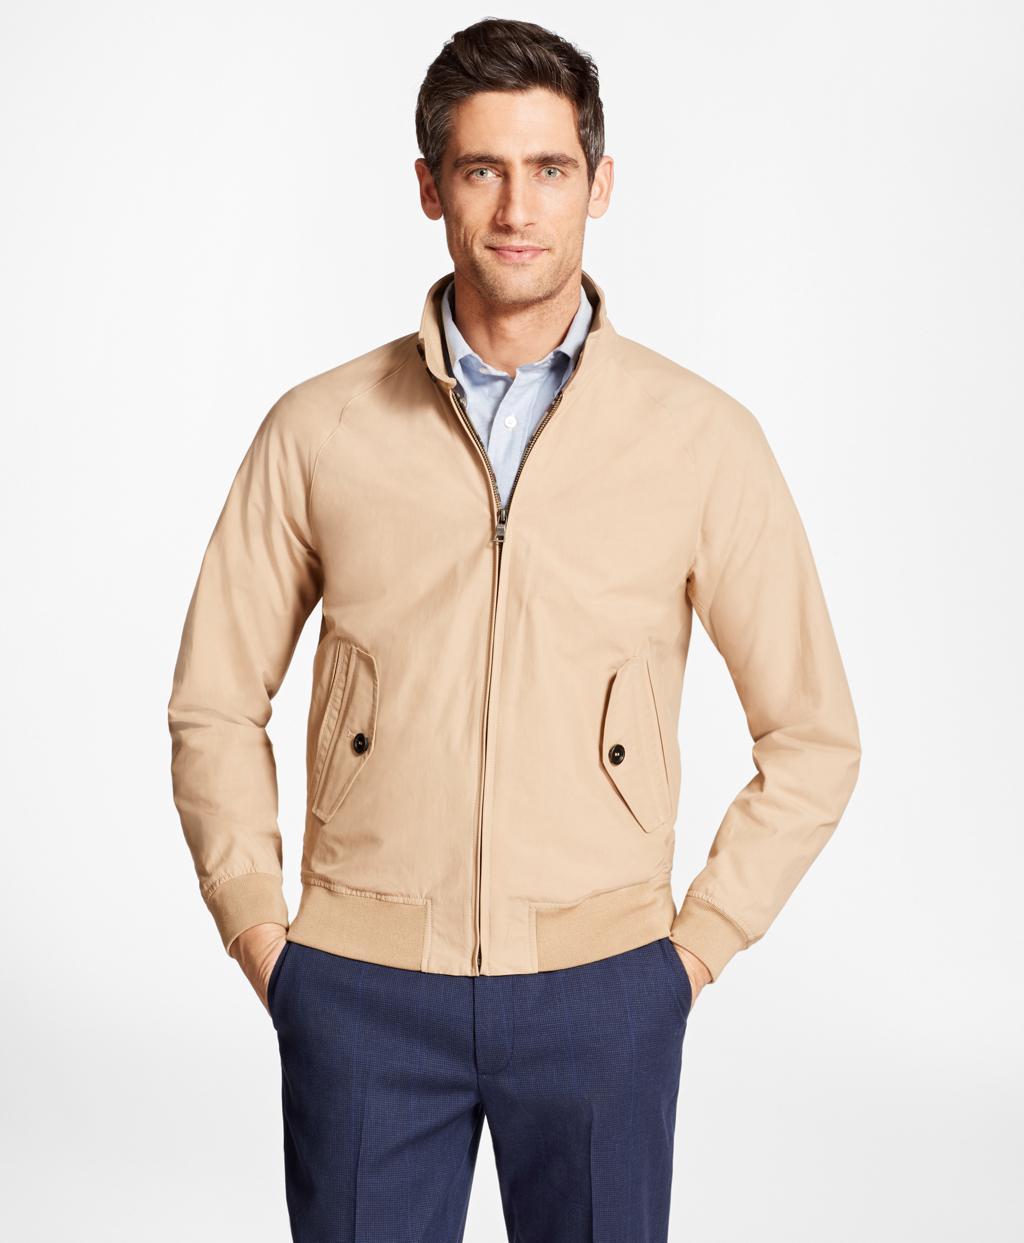 a6a591e5d Men's Natural Vintage Bomber Jacket